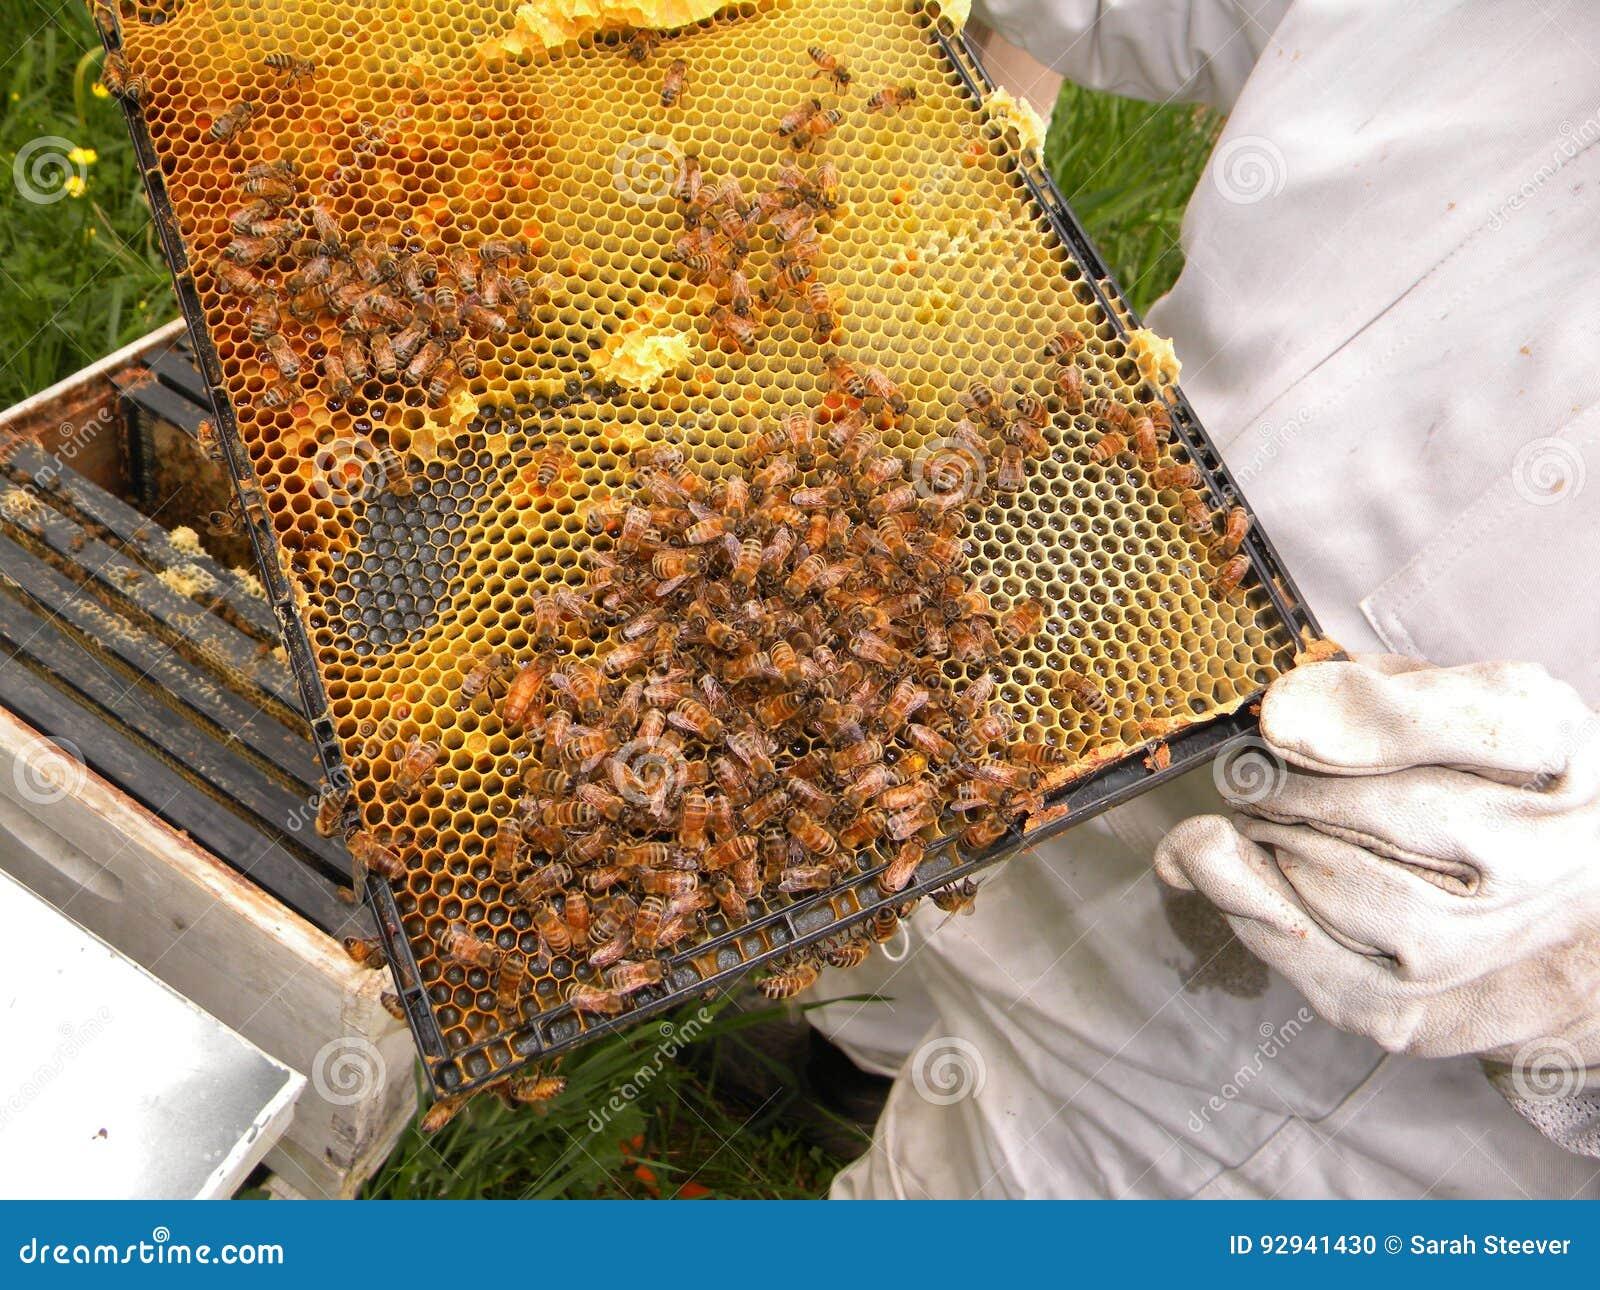 Honey Bees and Queen